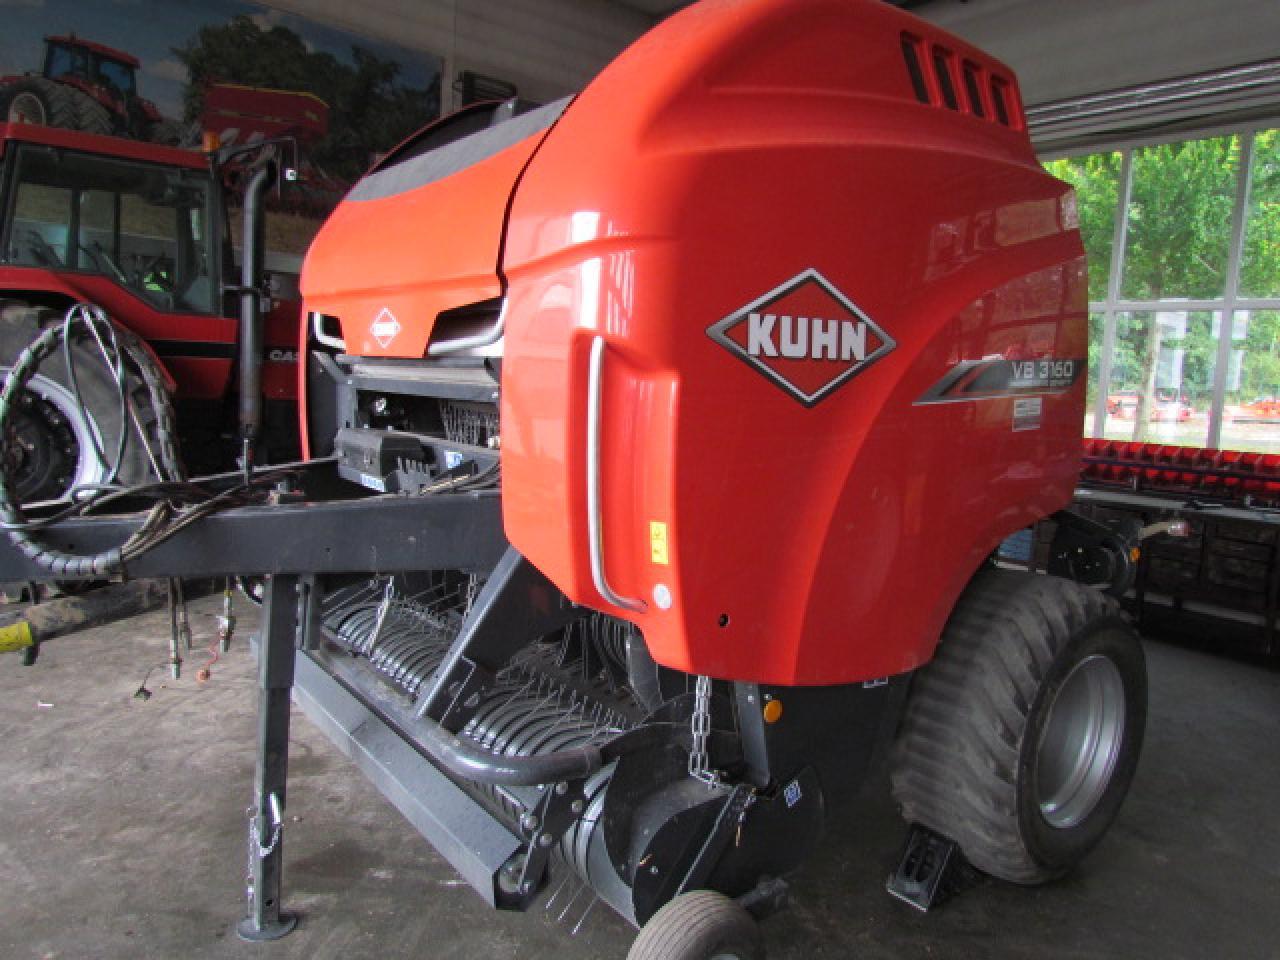 Kuhn VB3160 OC